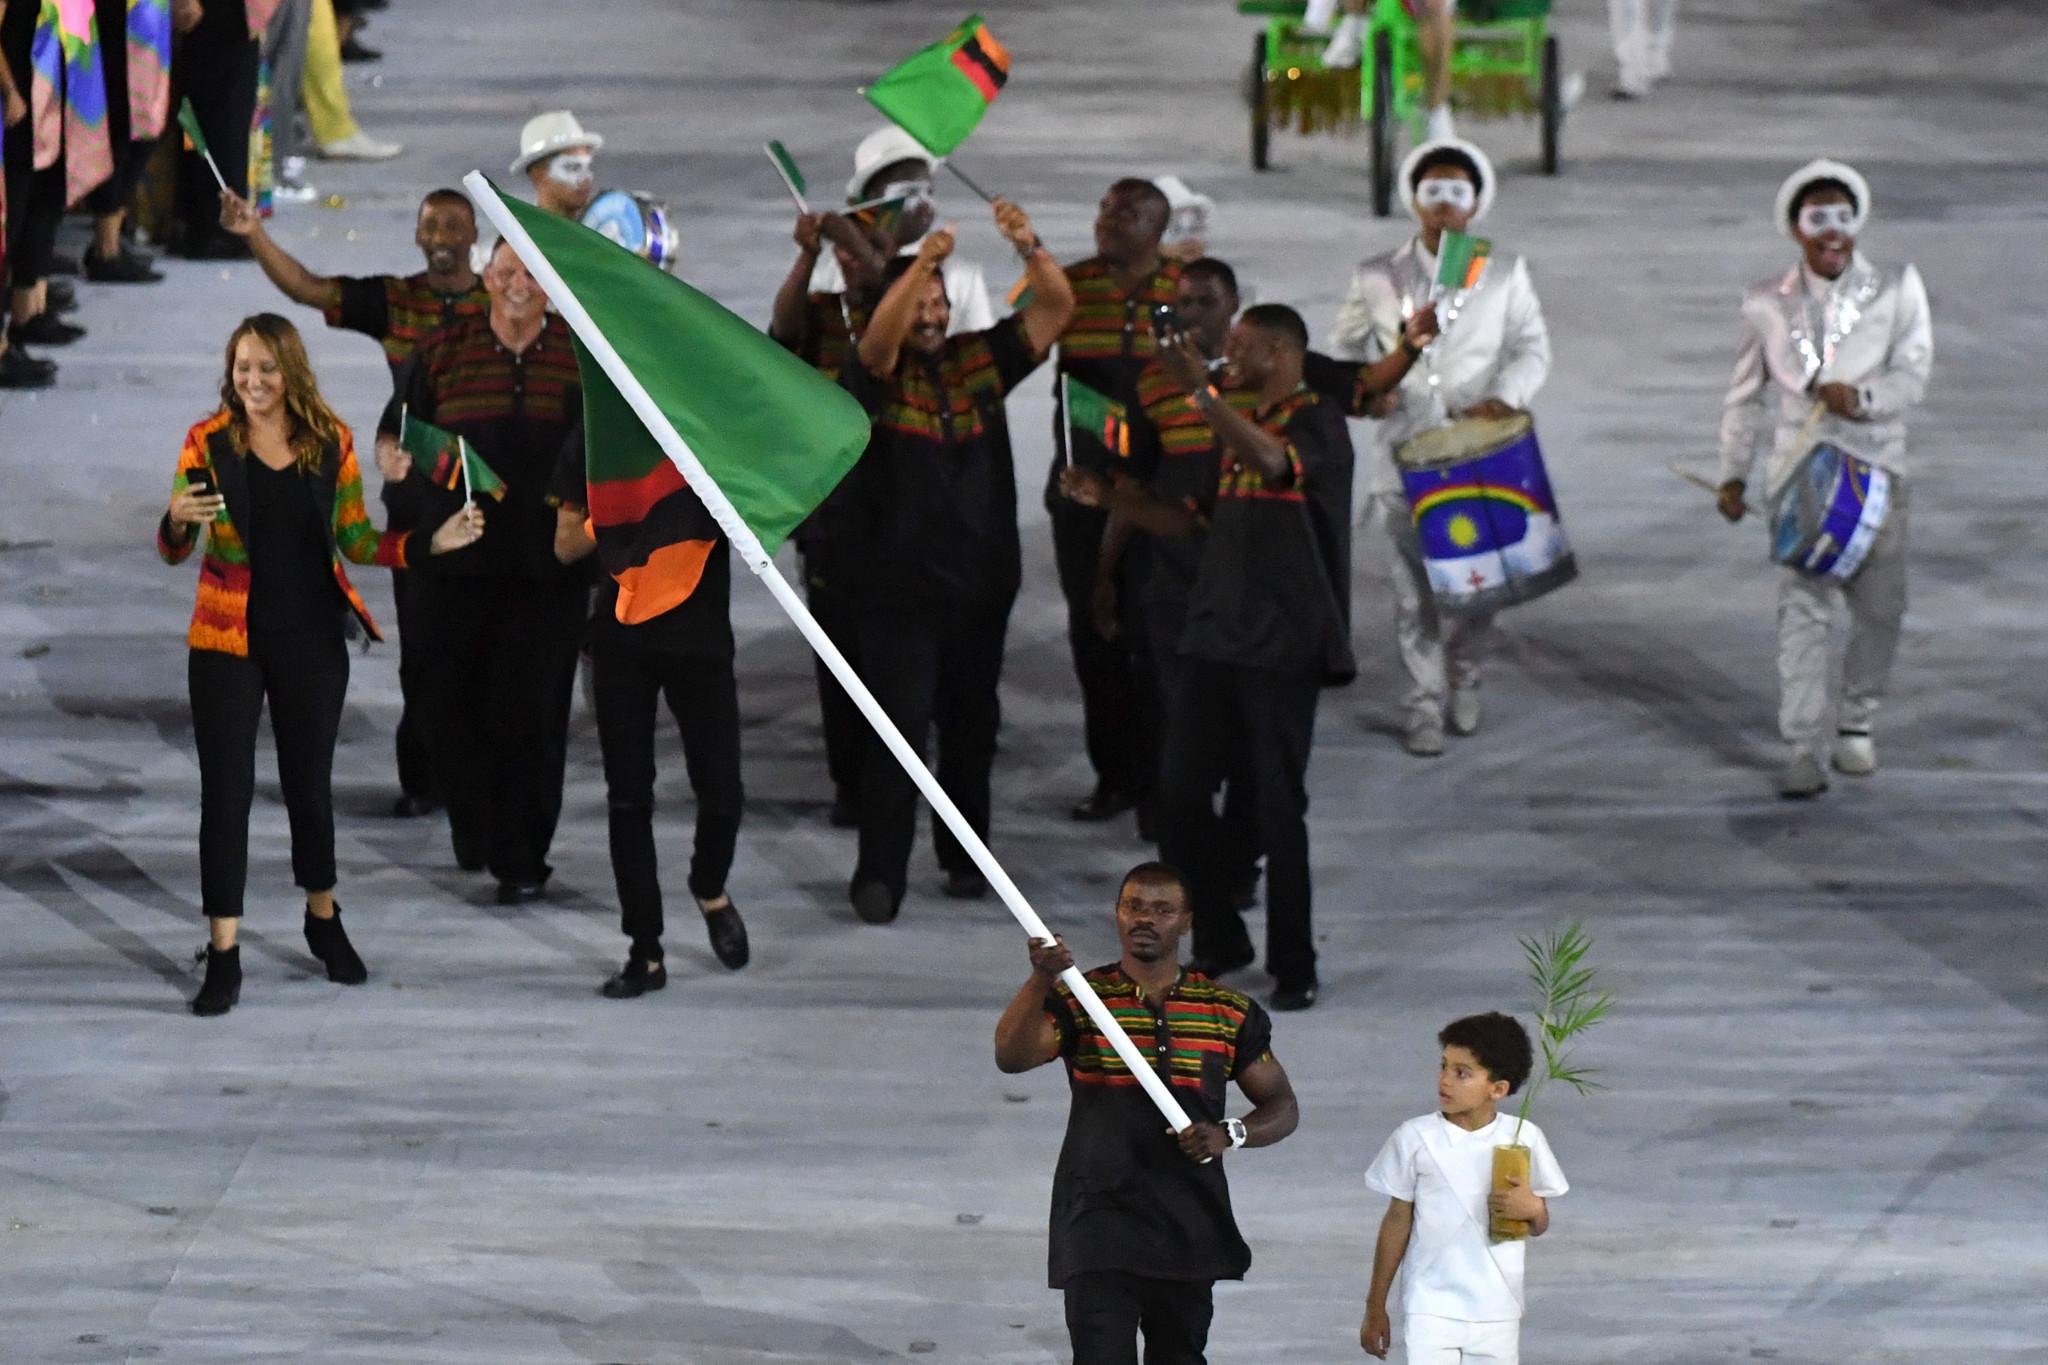 Jefe de Misión de Zambia advierte que funcionarios deberán ser